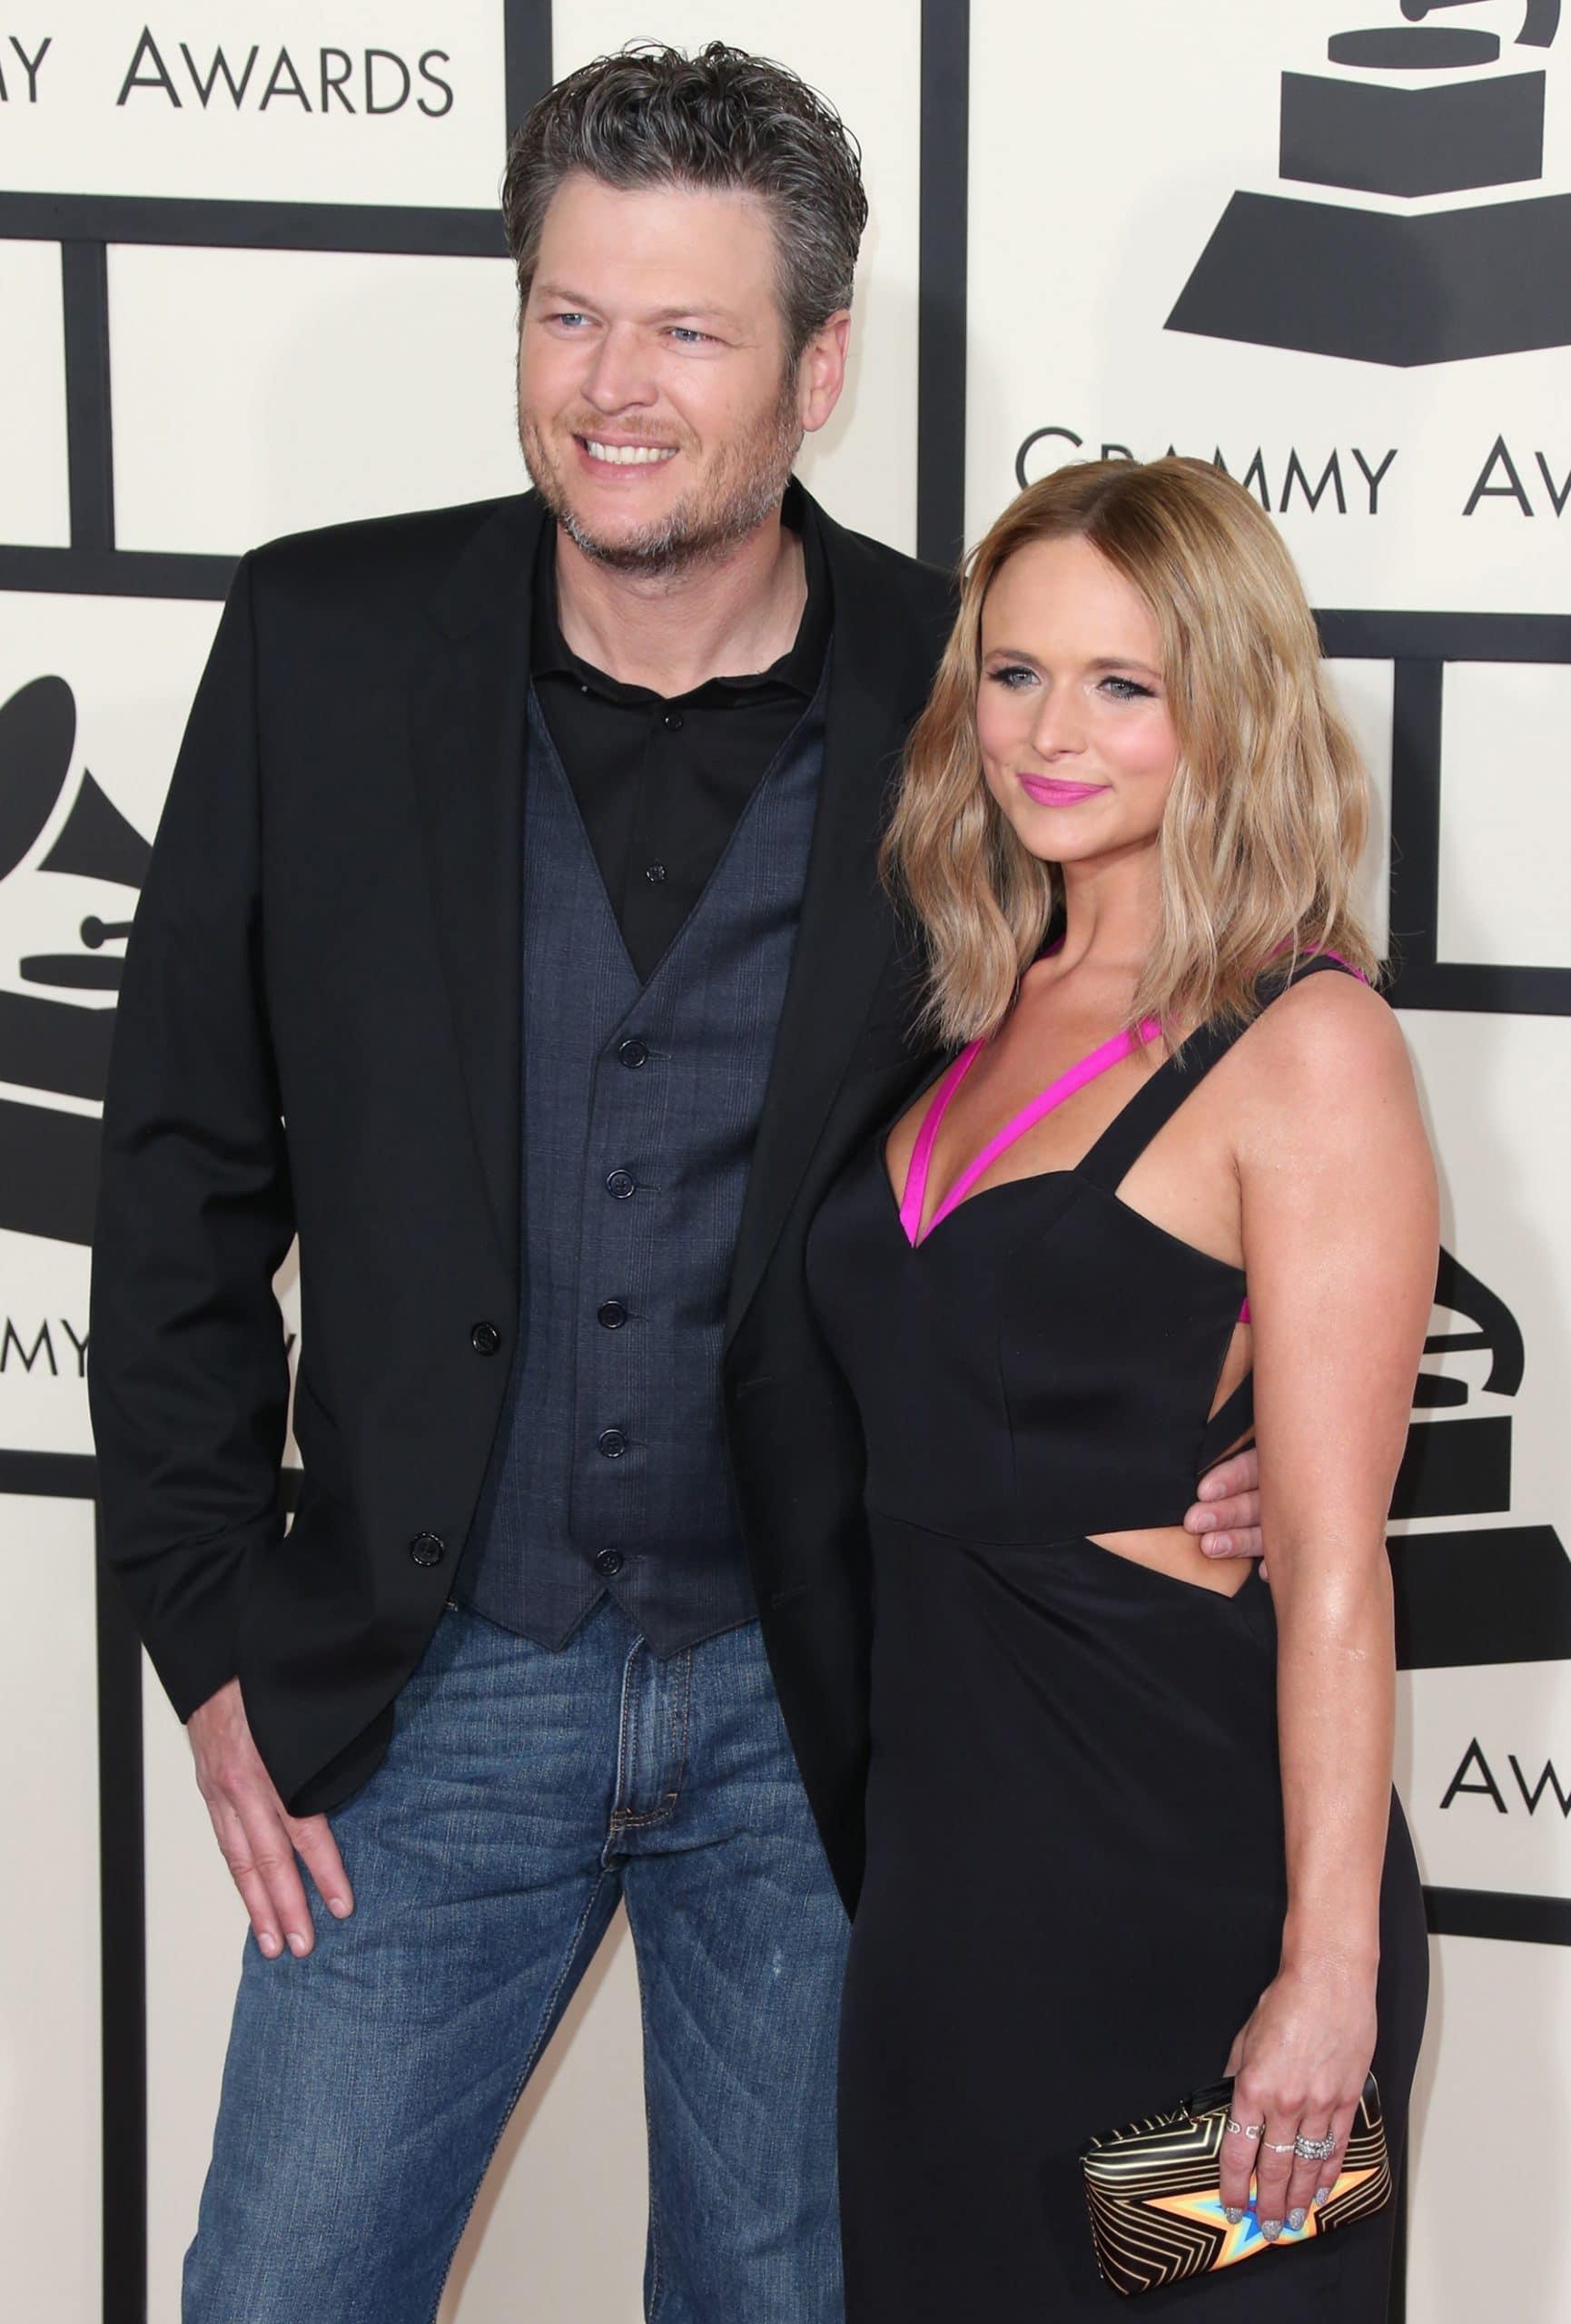 Blake Shelton and Miranda Lambert met in 2005, married in May 2011, and announced their divorce in July 2015